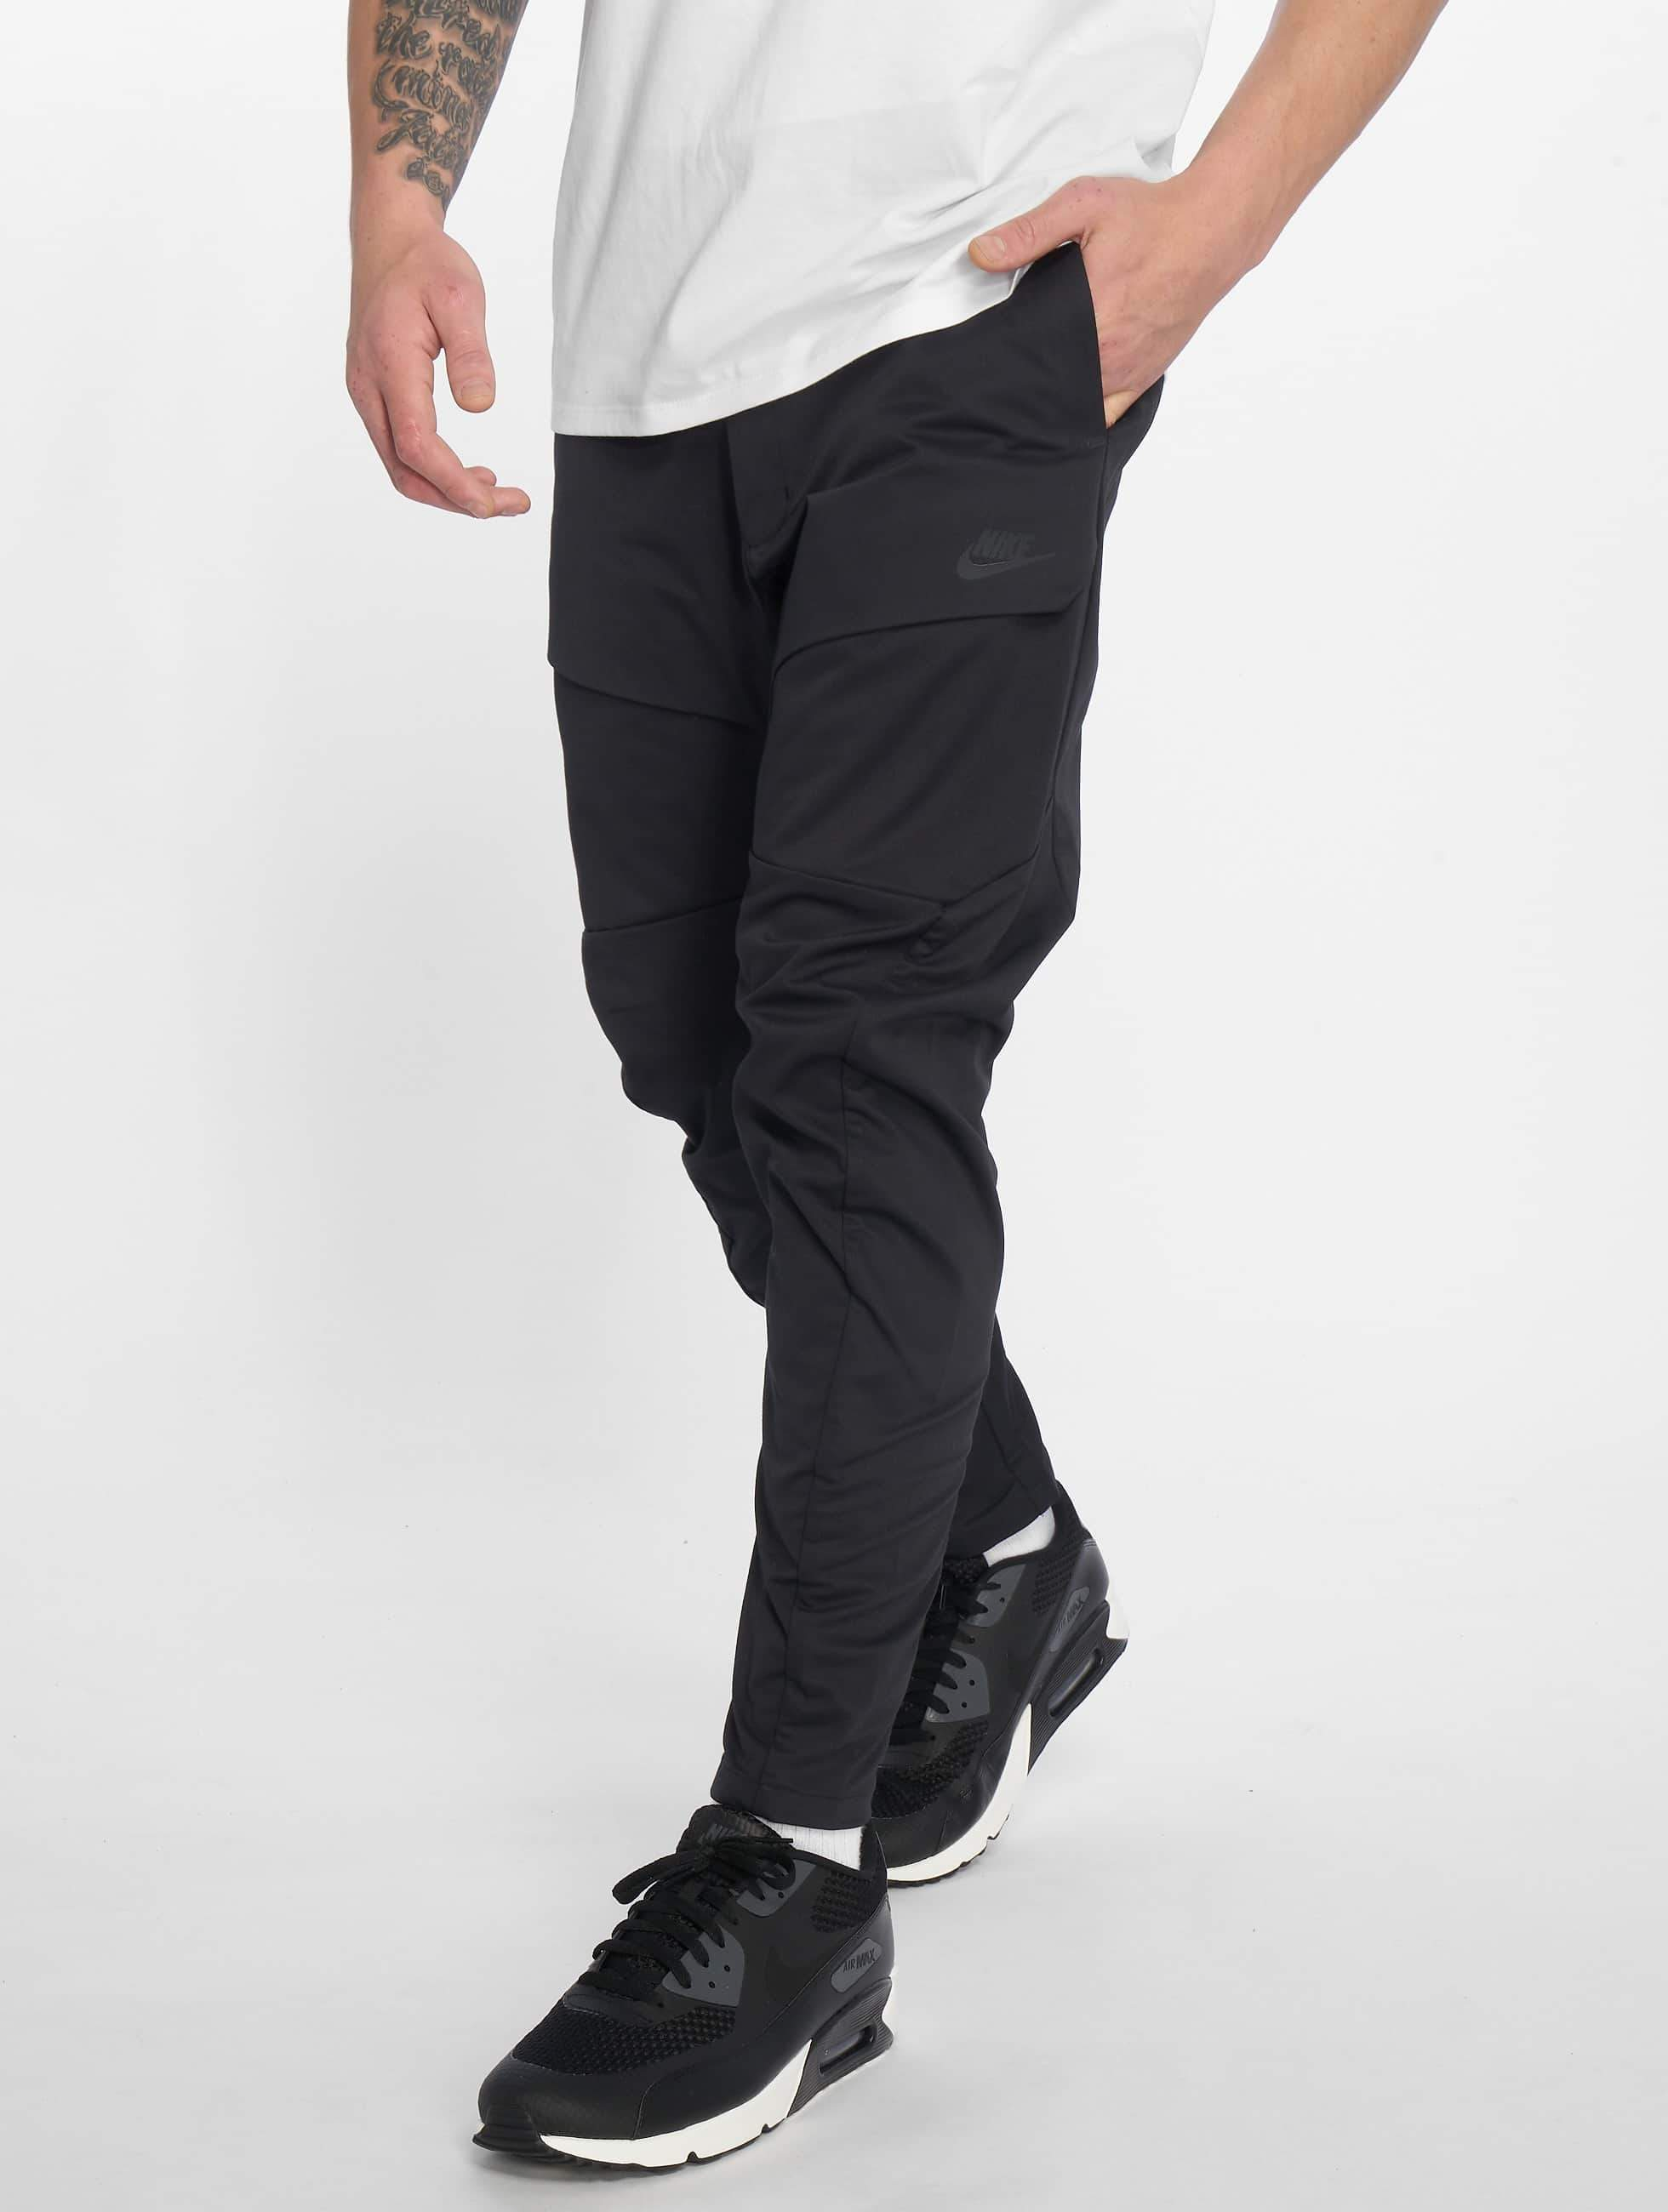 fa1a0497cbb26 Nike Herren Jogginghose Tech Pack in schwarz 540503